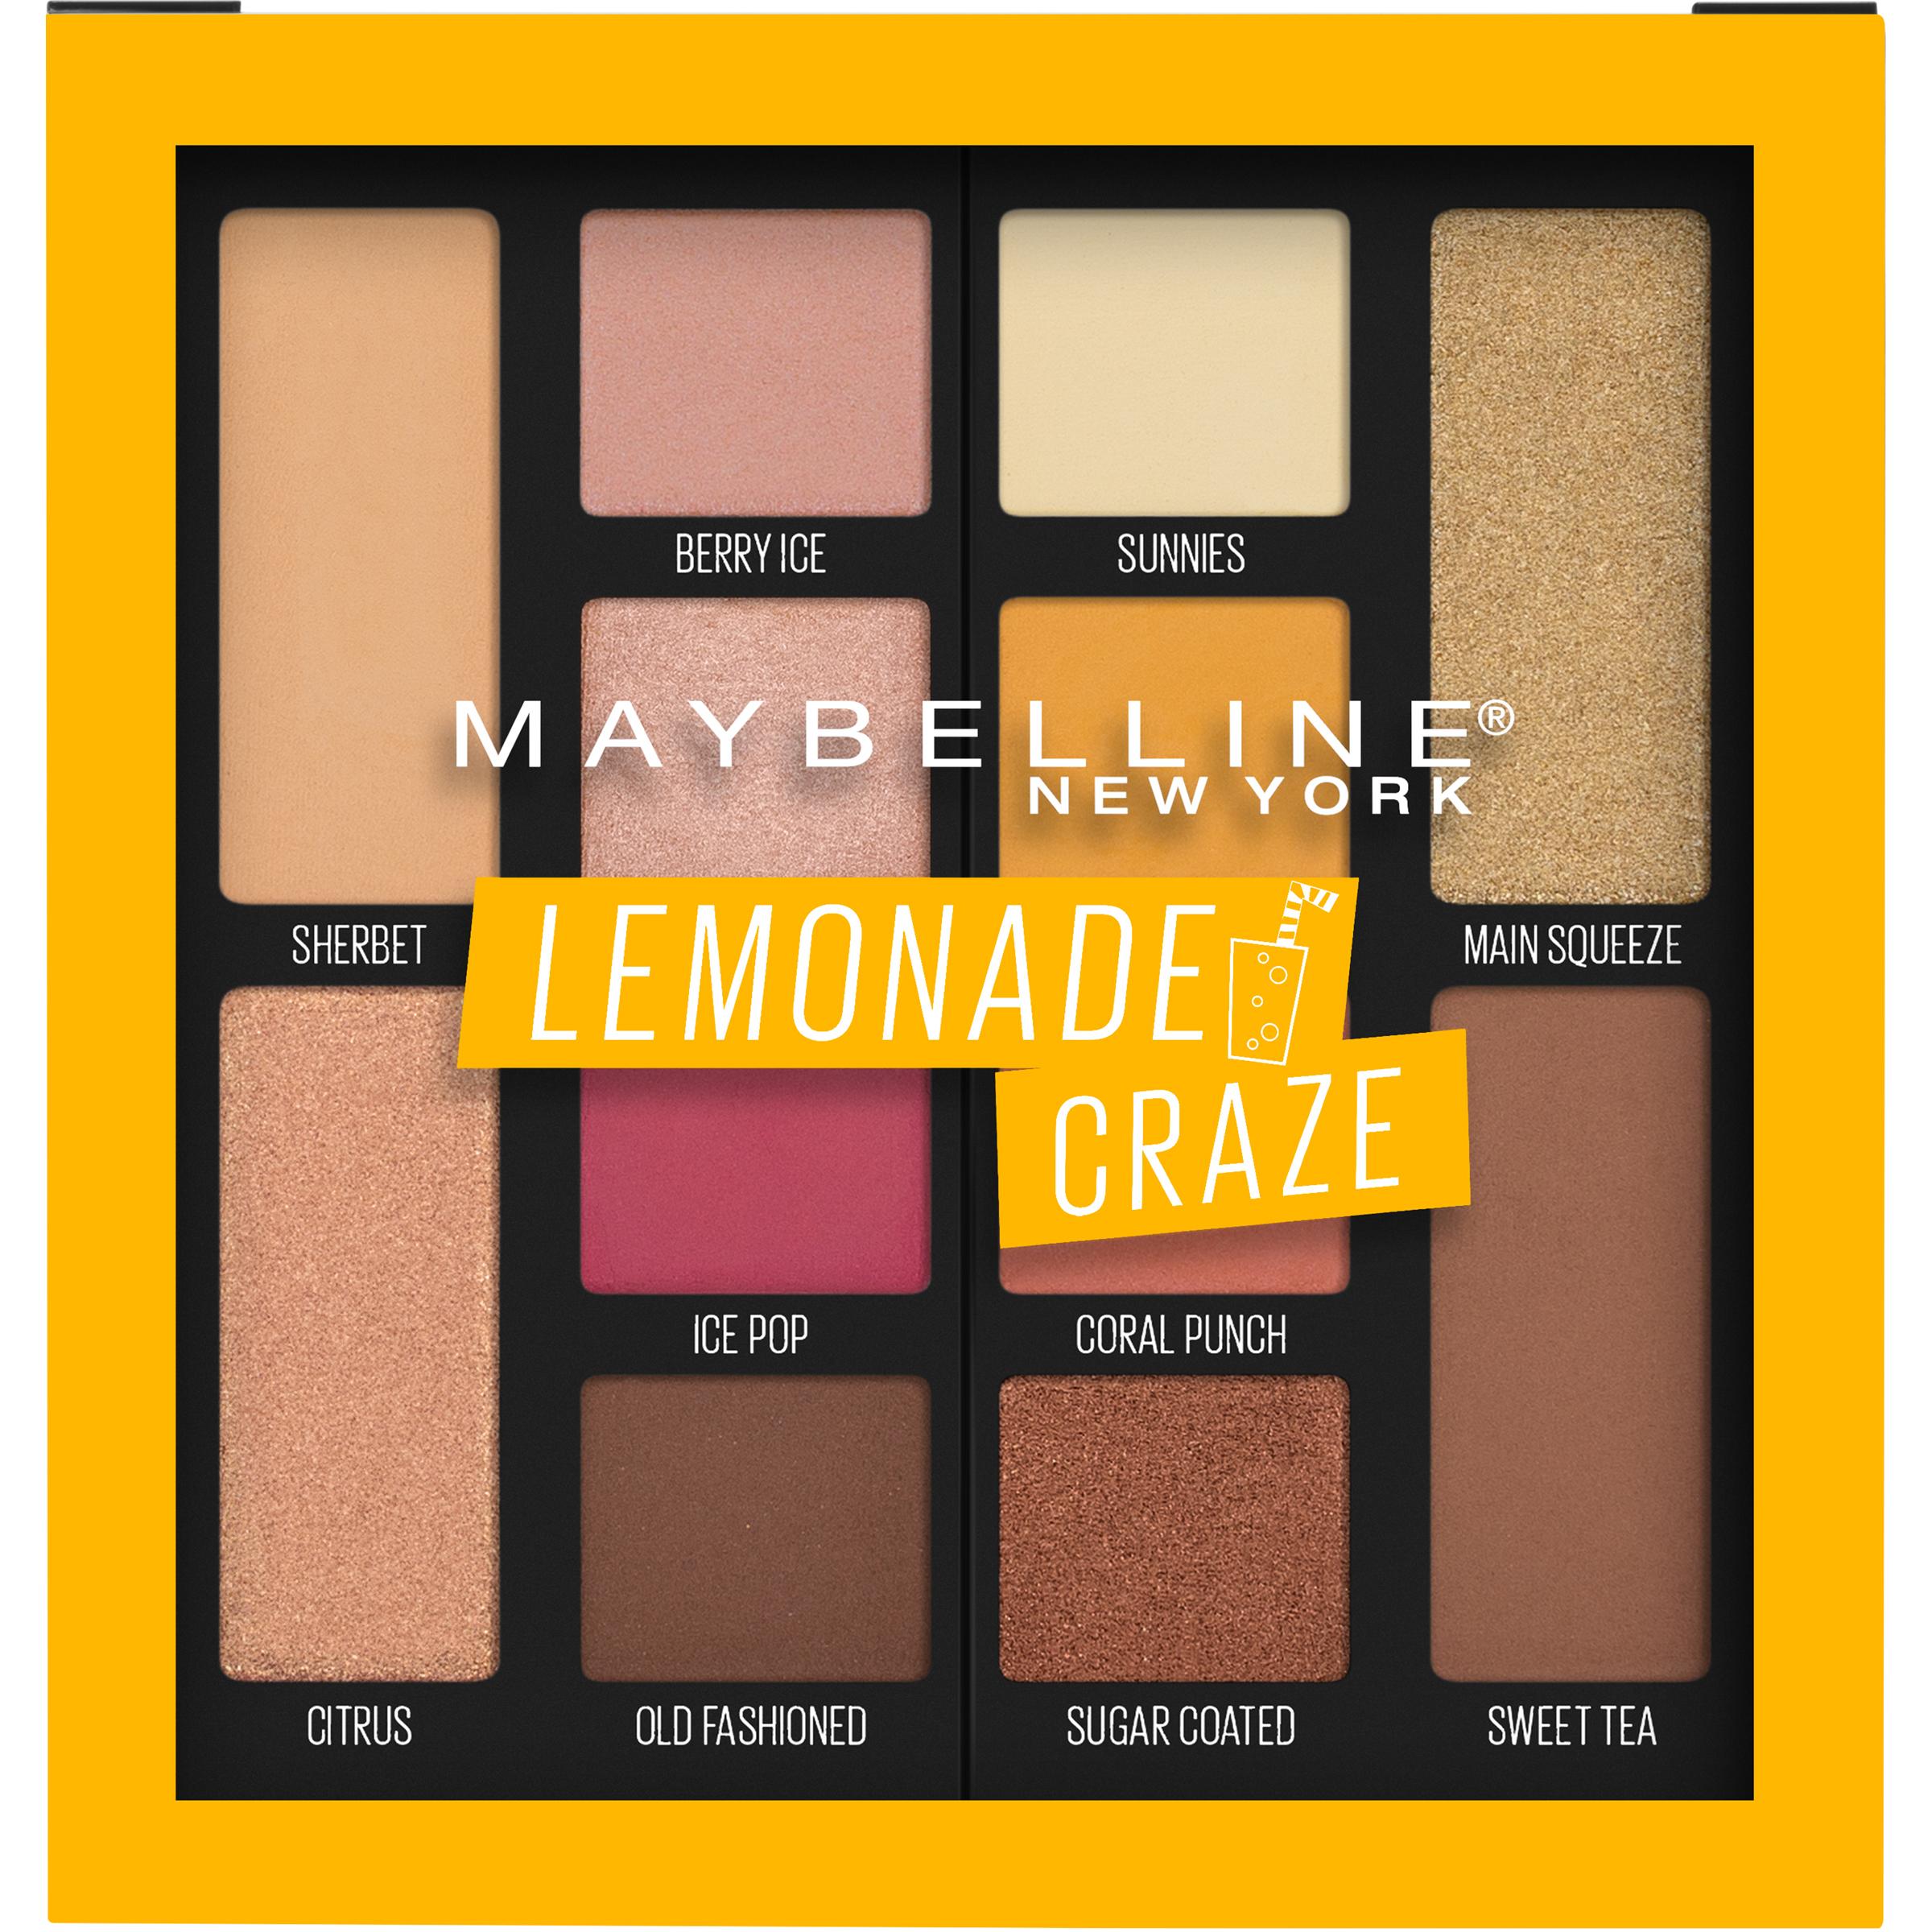 Maybelline New York Lemonade Craze Eye Shadow Palette